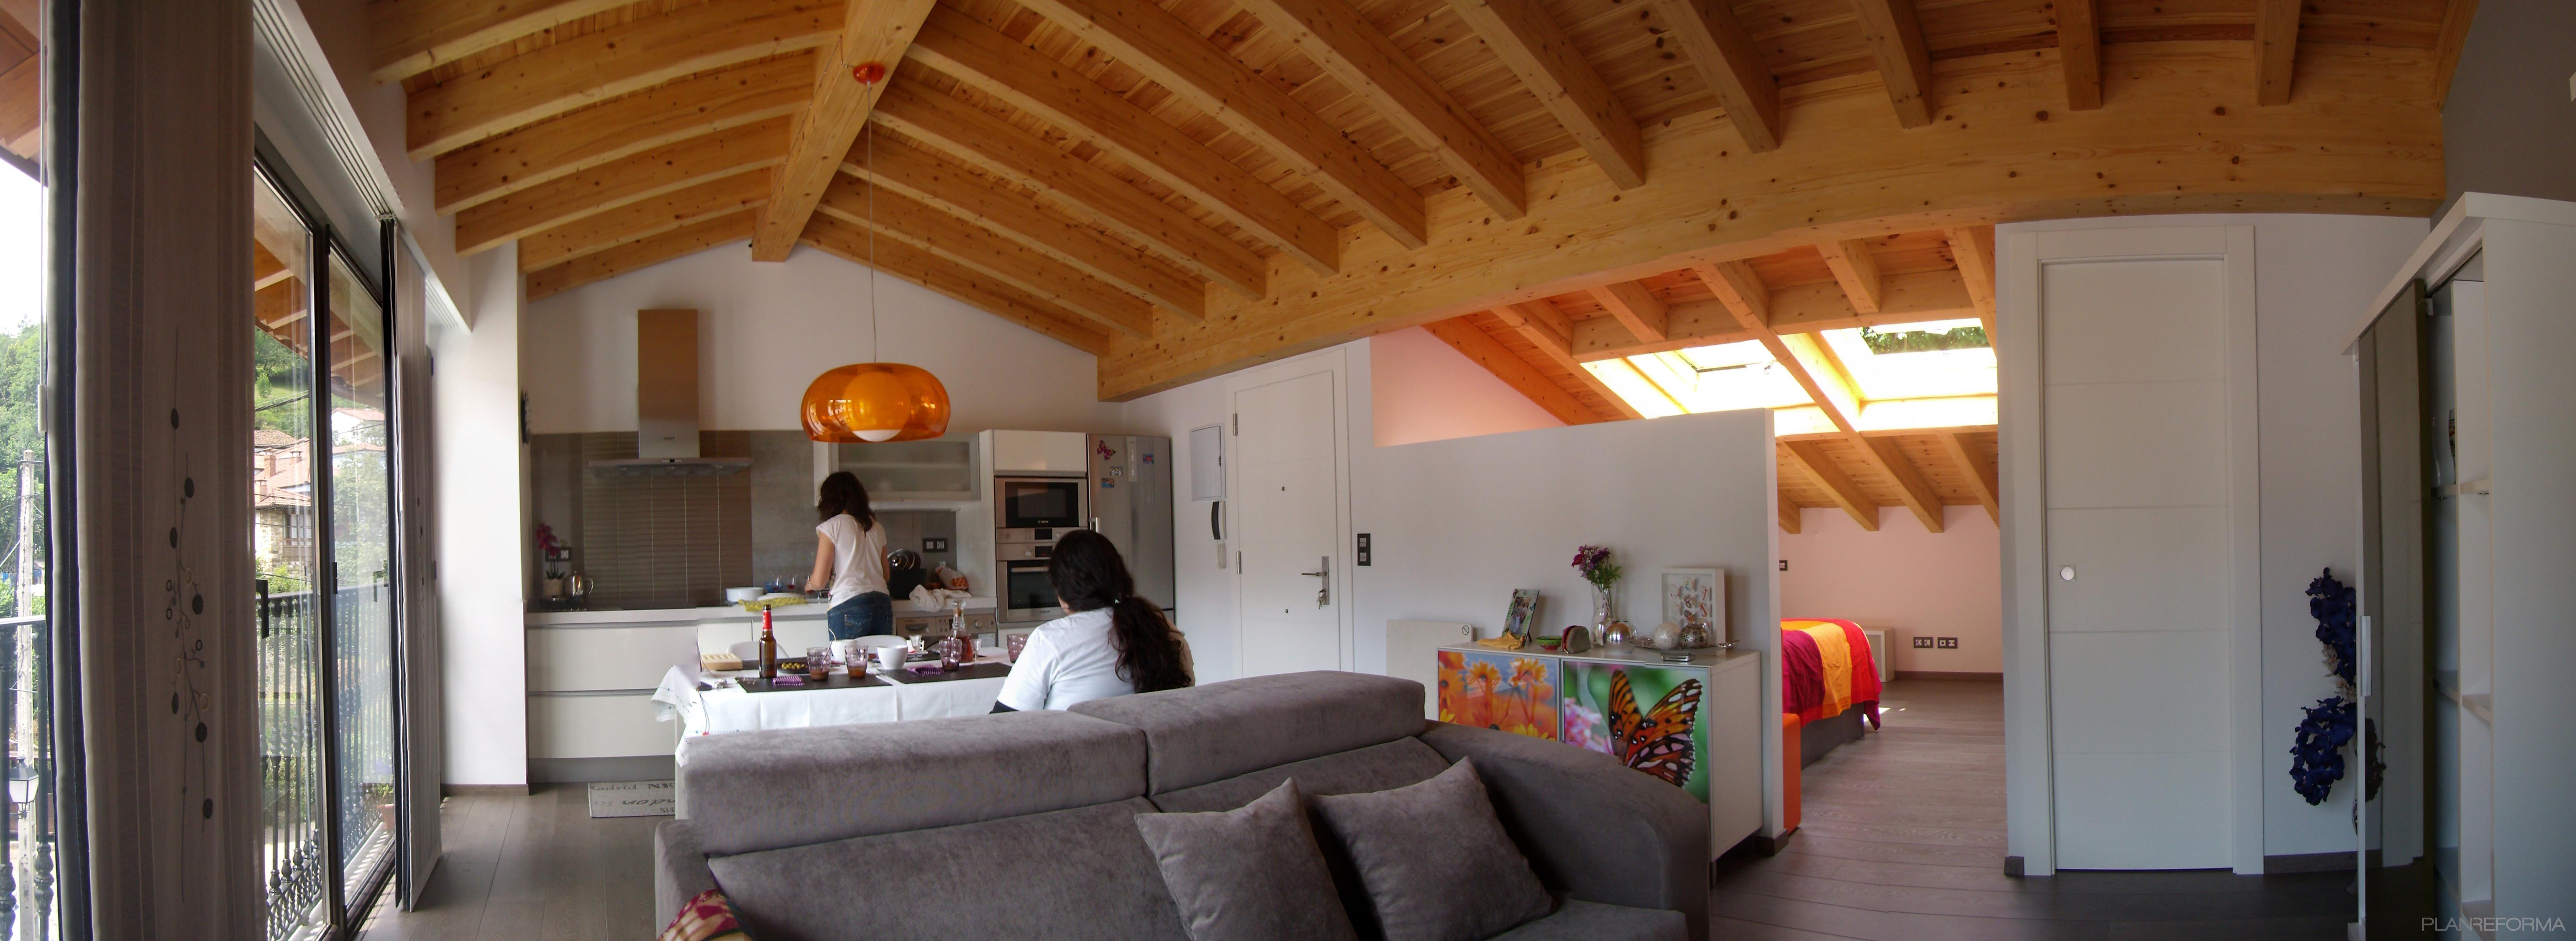 Comedor cocina salon loft estilo moderno color marron for Comedor estilo moderno